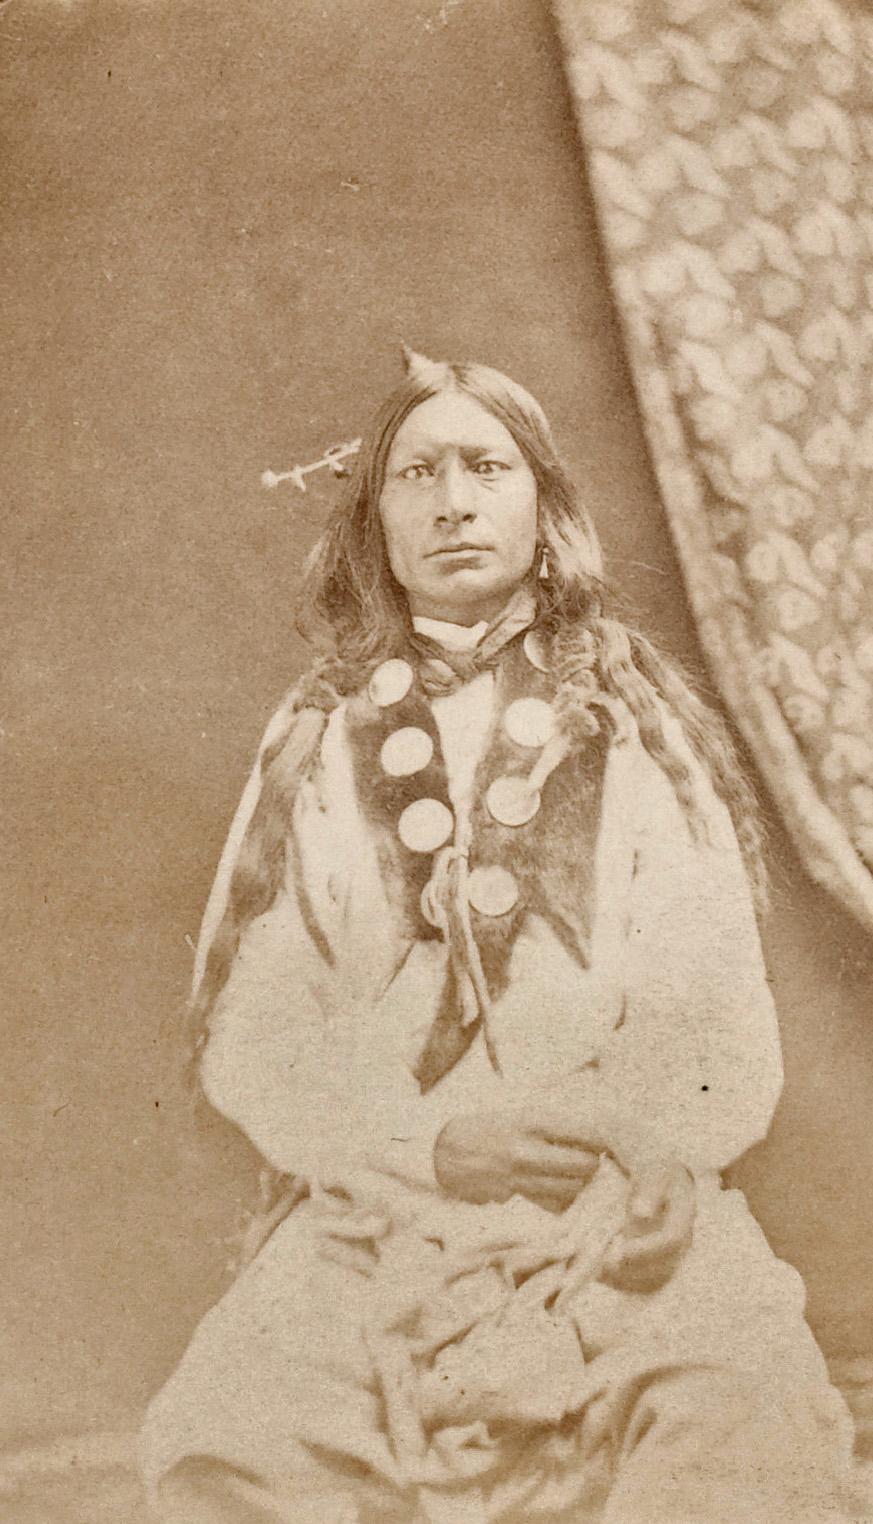 http://www.american-tribes.com/messageboards/dietmar/Cheyennes1men2.jpg